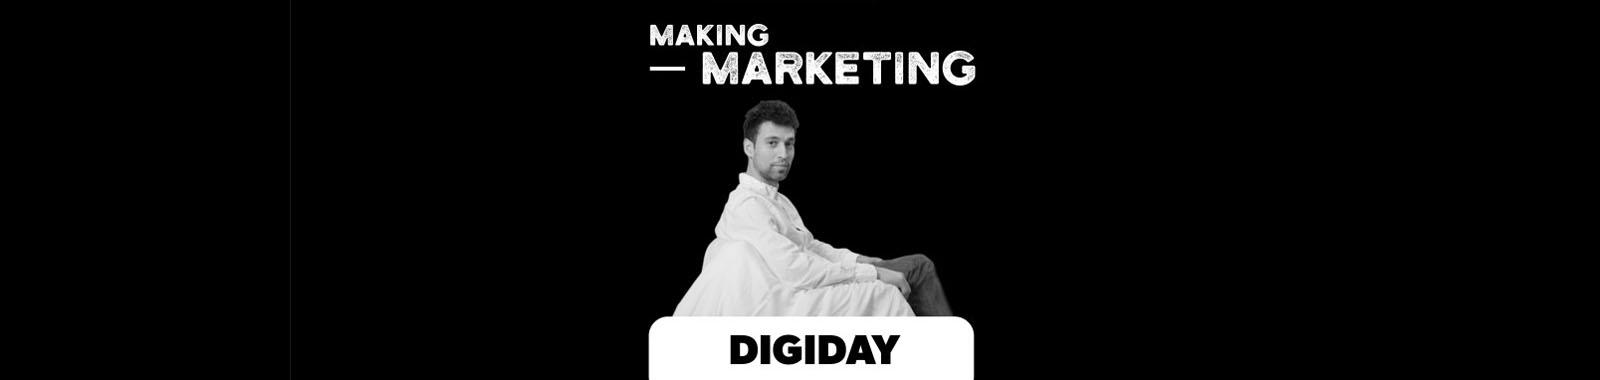 making_marketing_Paul-Shaked-eye